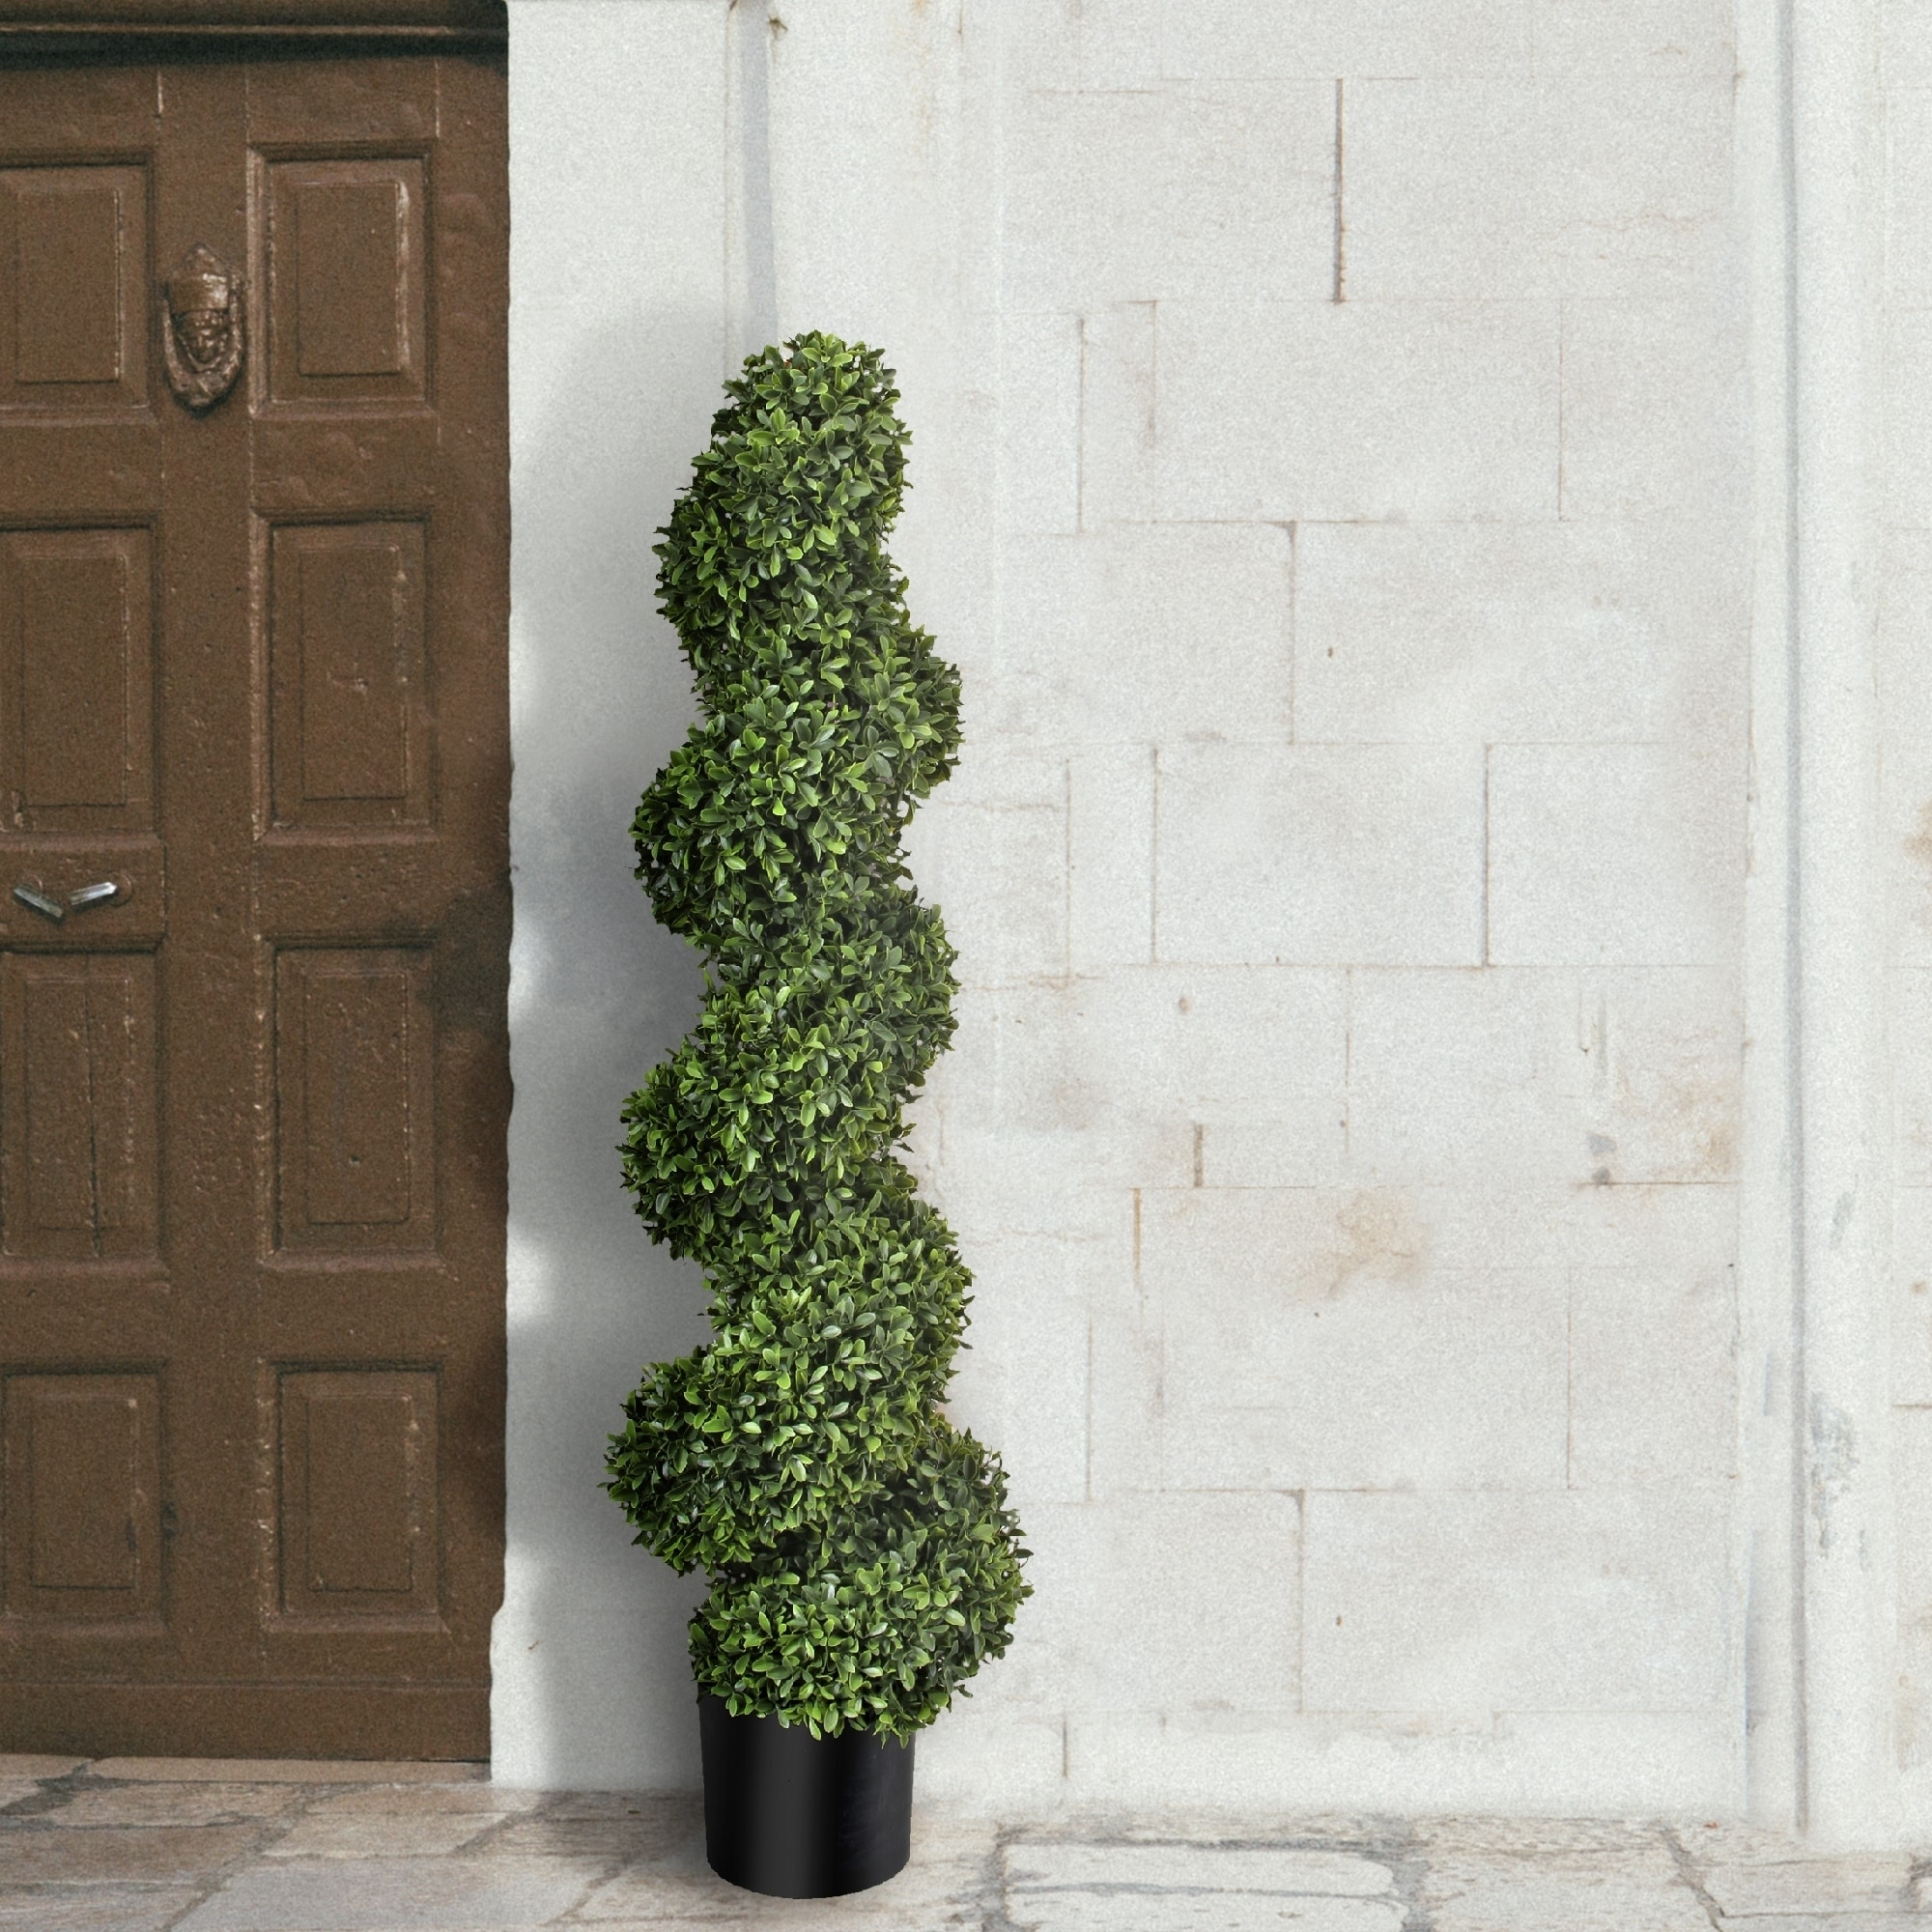 American Boxwood Spiral Topiary 47 - Plastic